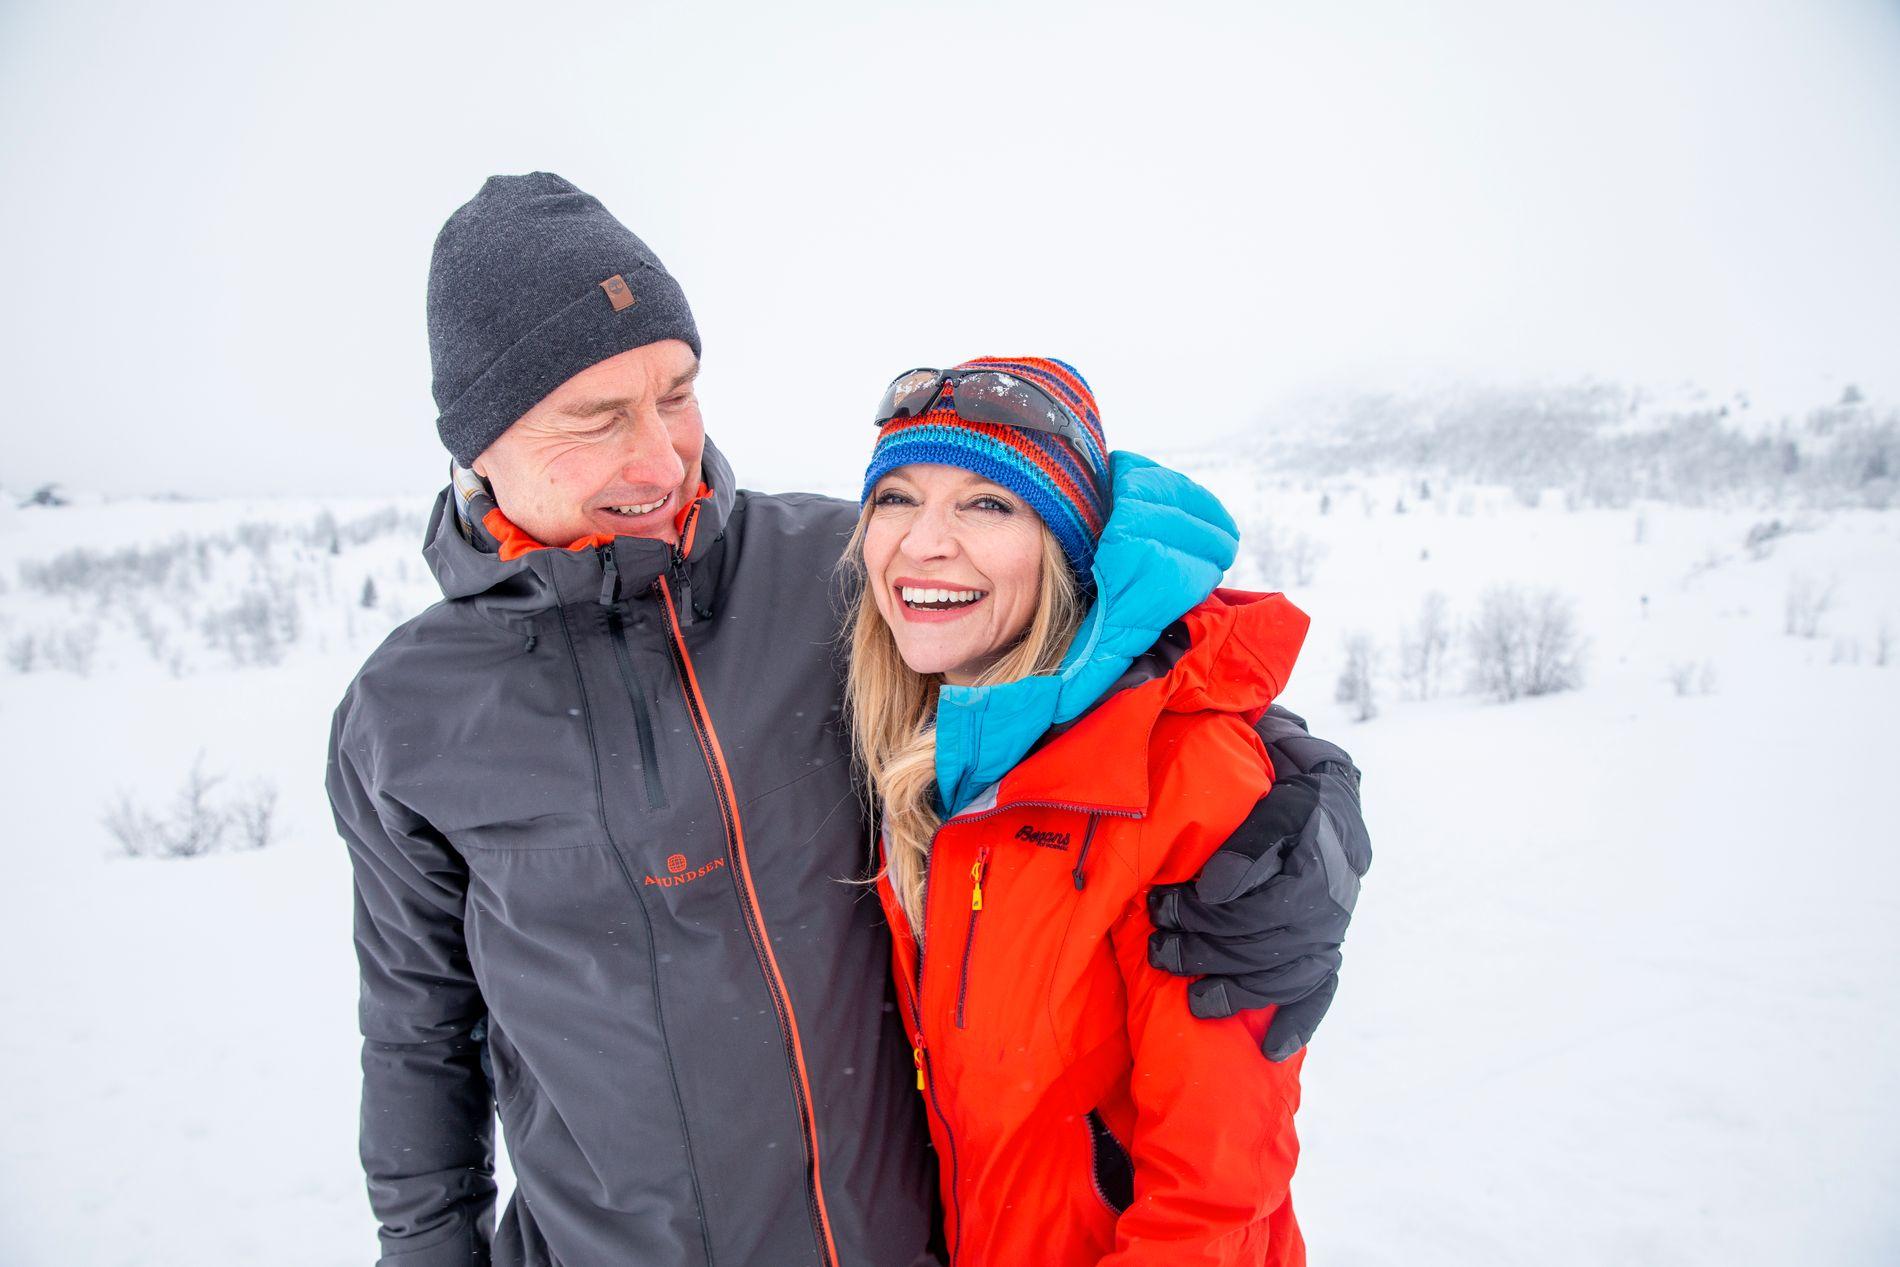 VINTERIDYLL: Trude Mostue koste seg på Beitostølen sammen med samboeren Cato Sælid i vinterferien da VG kom på besøk.